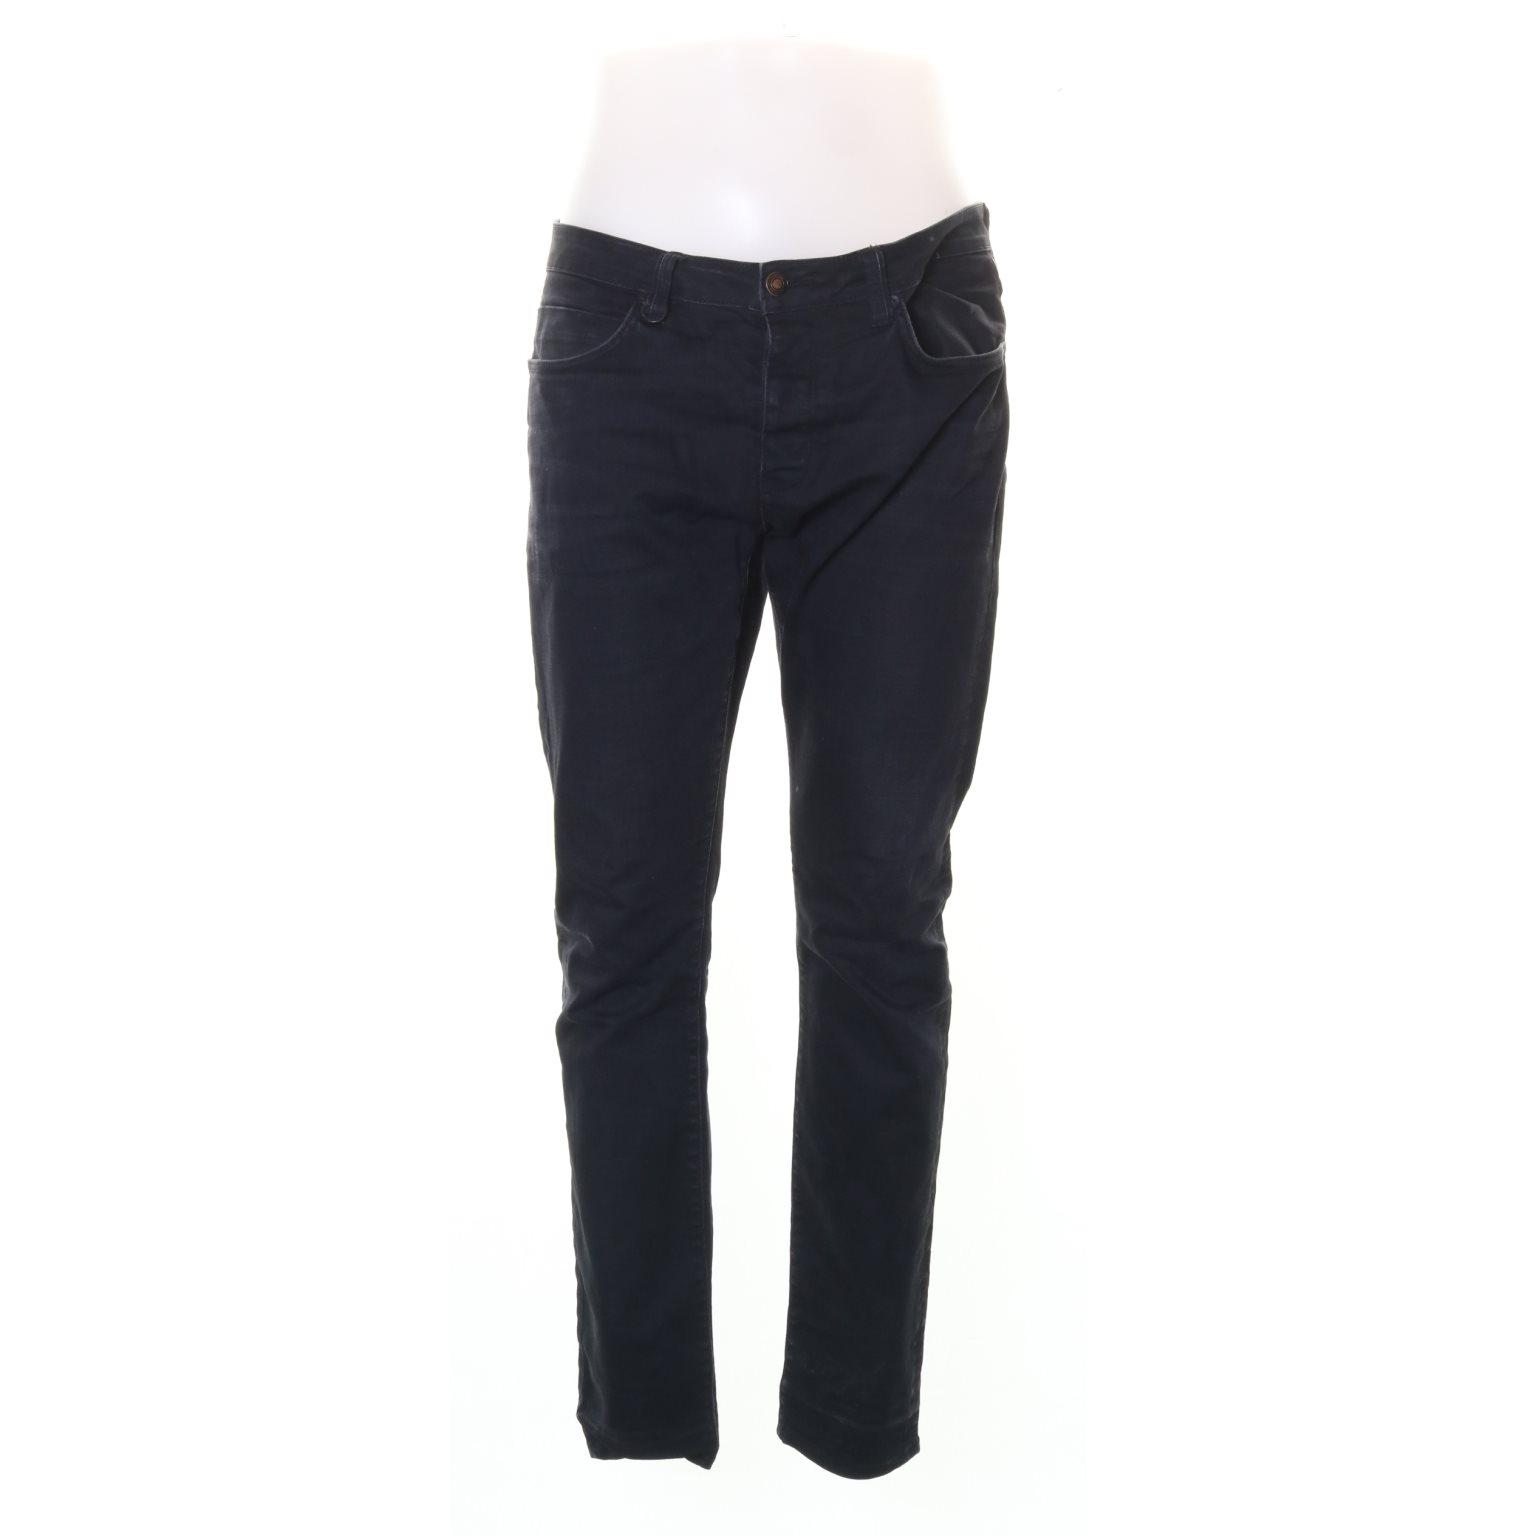 Neuw, Jeans, Strl: 34/34, IGGY SKINNY, Mörkgrå